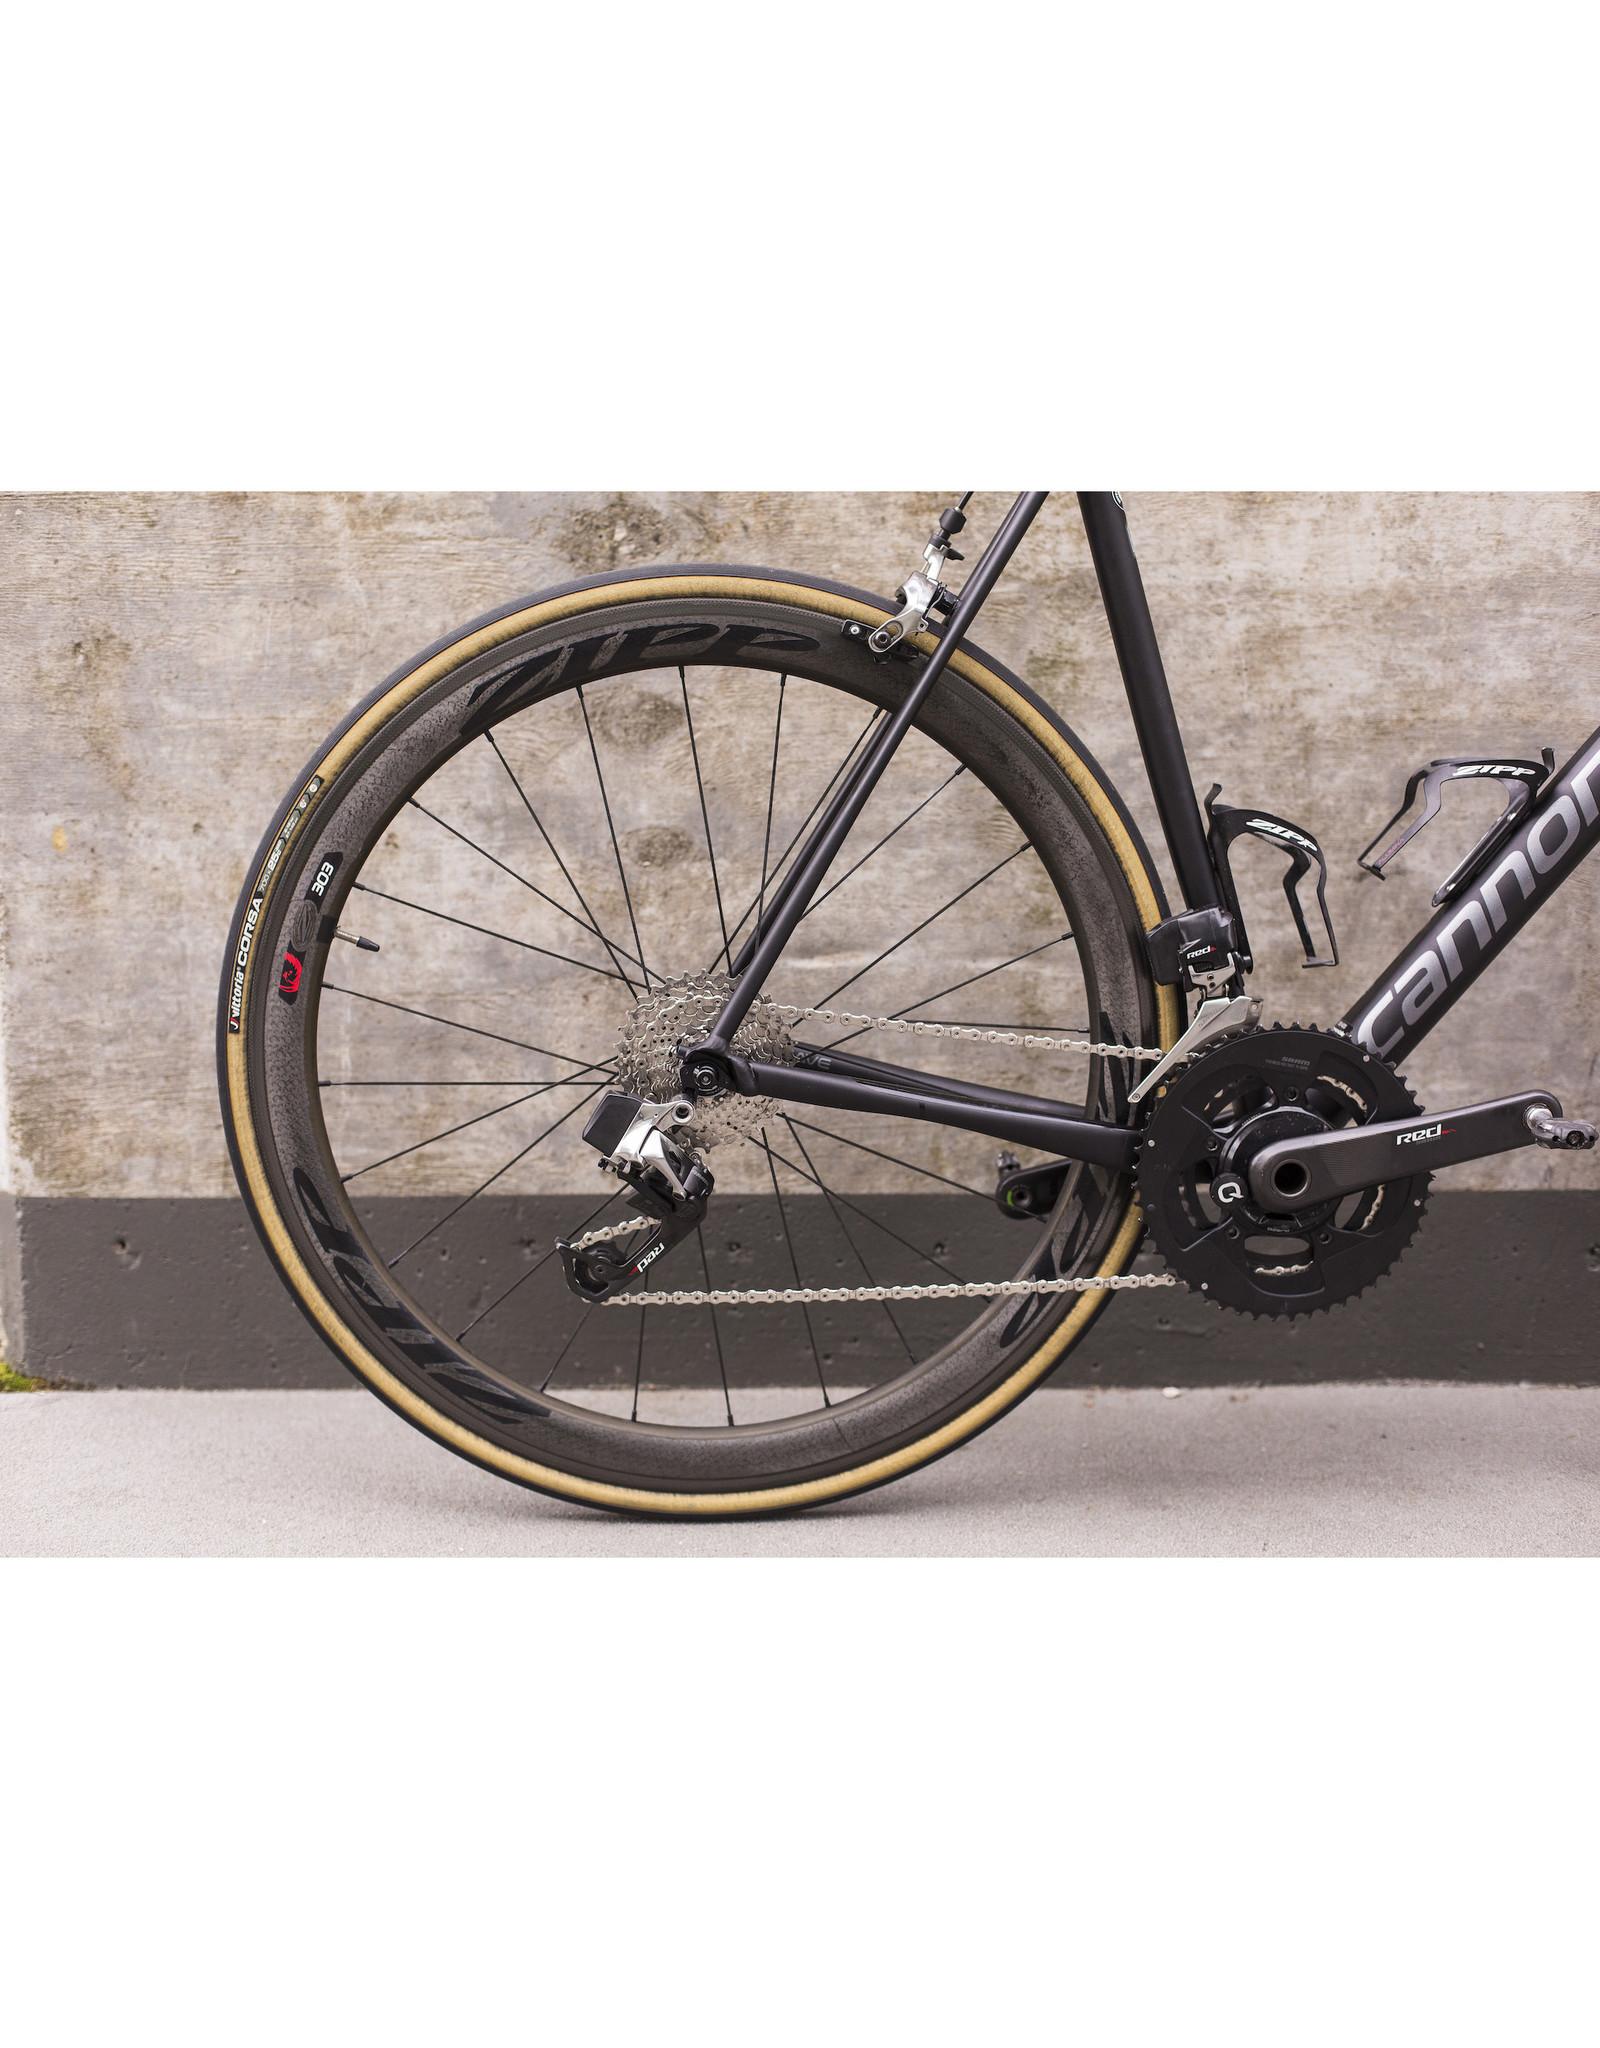 Seabass Cycles Cannondale - CAAD12 Ultegra - Custom Build